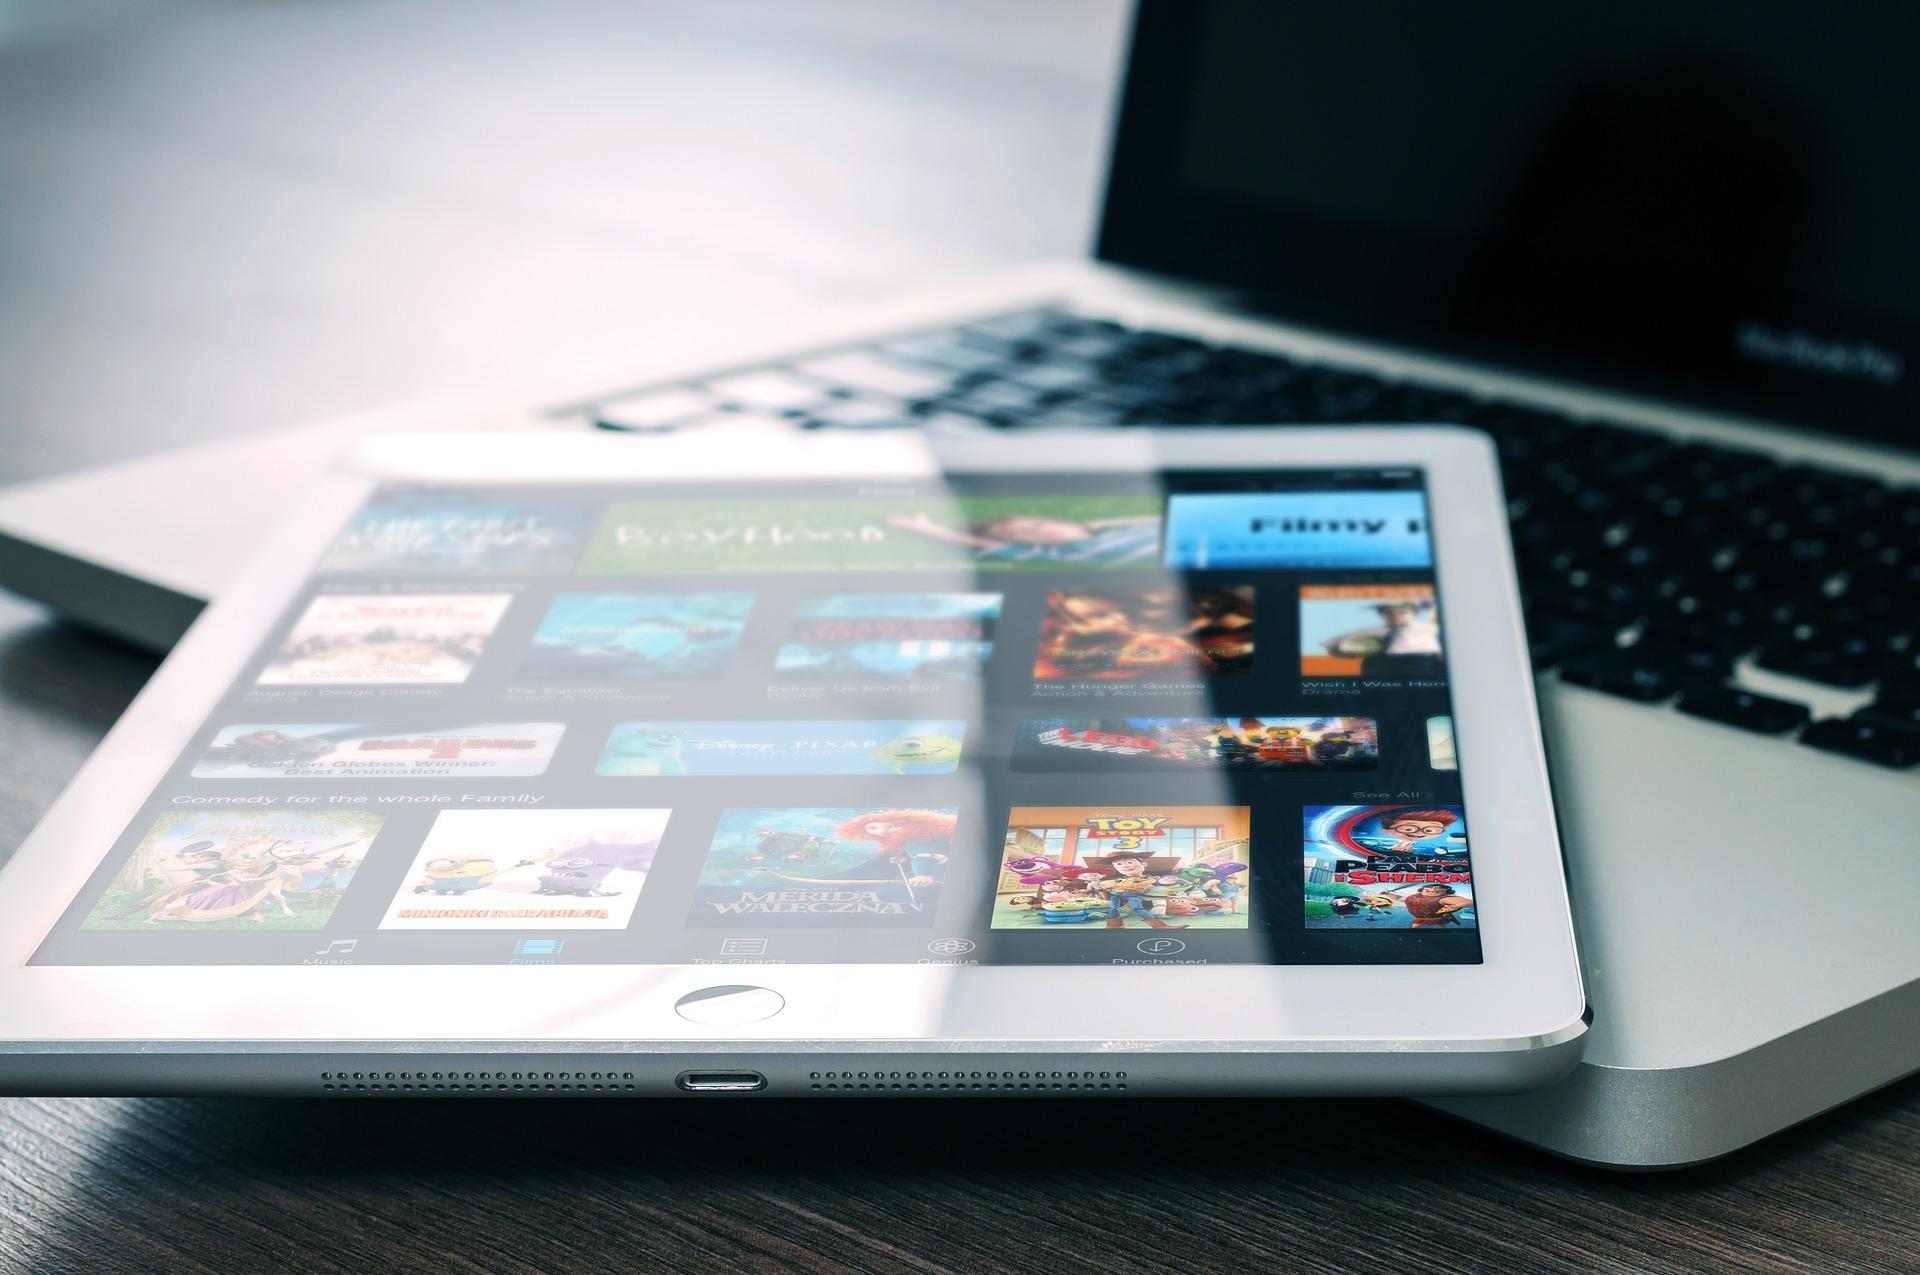 Tablet sitting on laptop